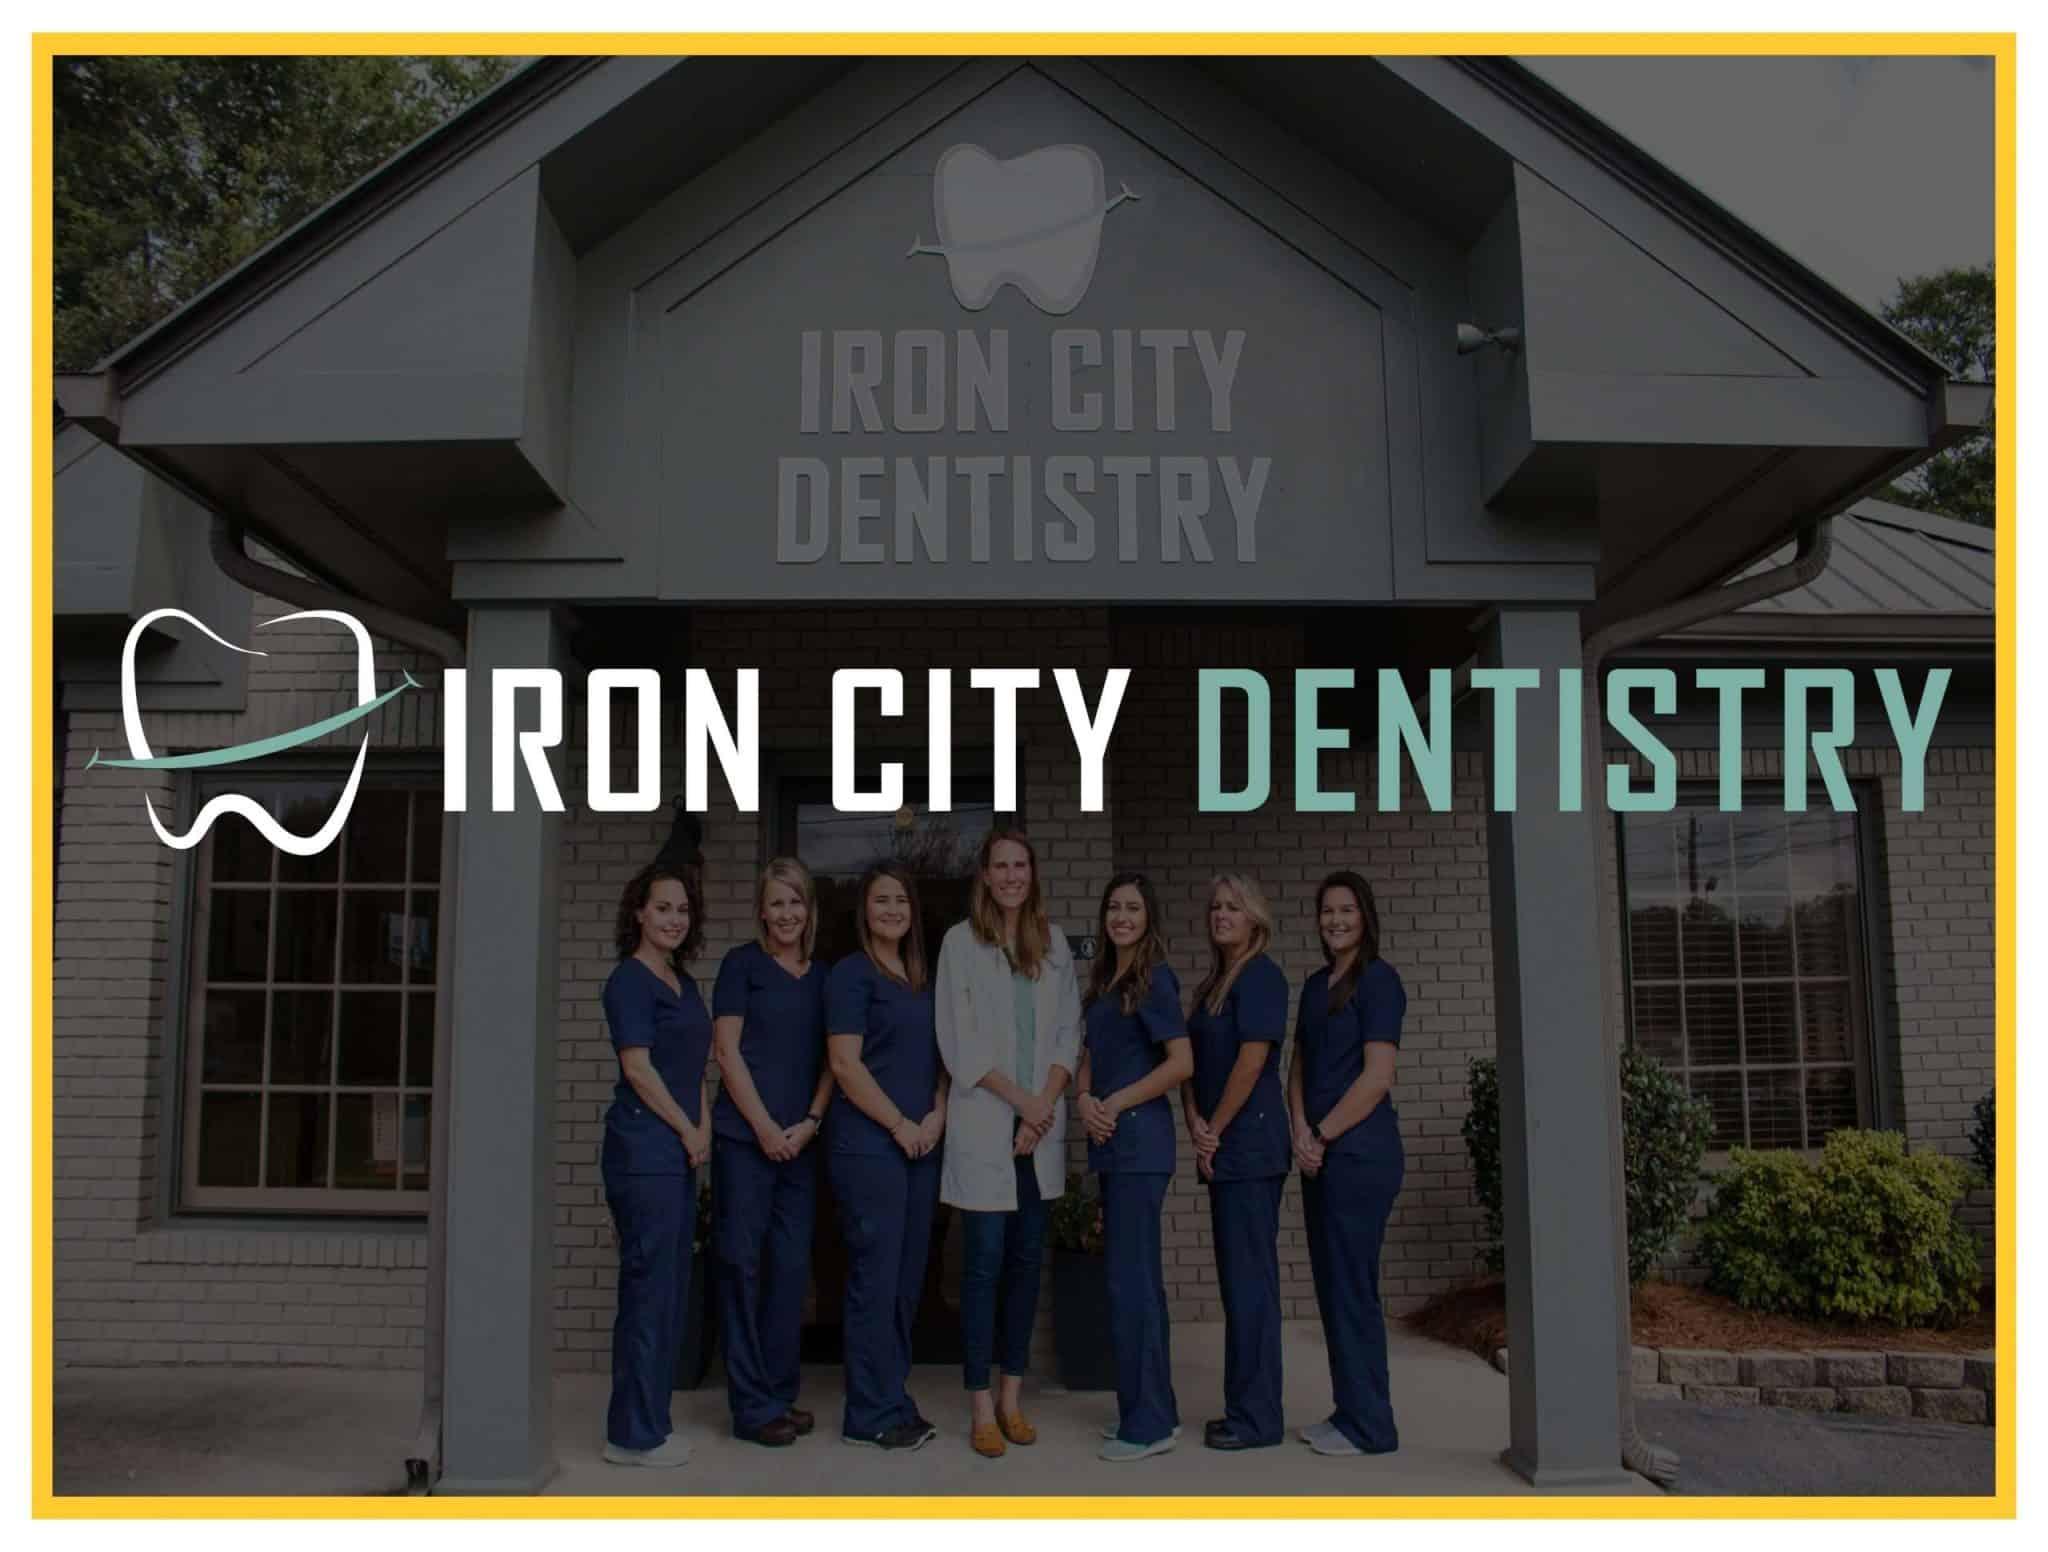 Dotedison_CS_Iron City Dentistry